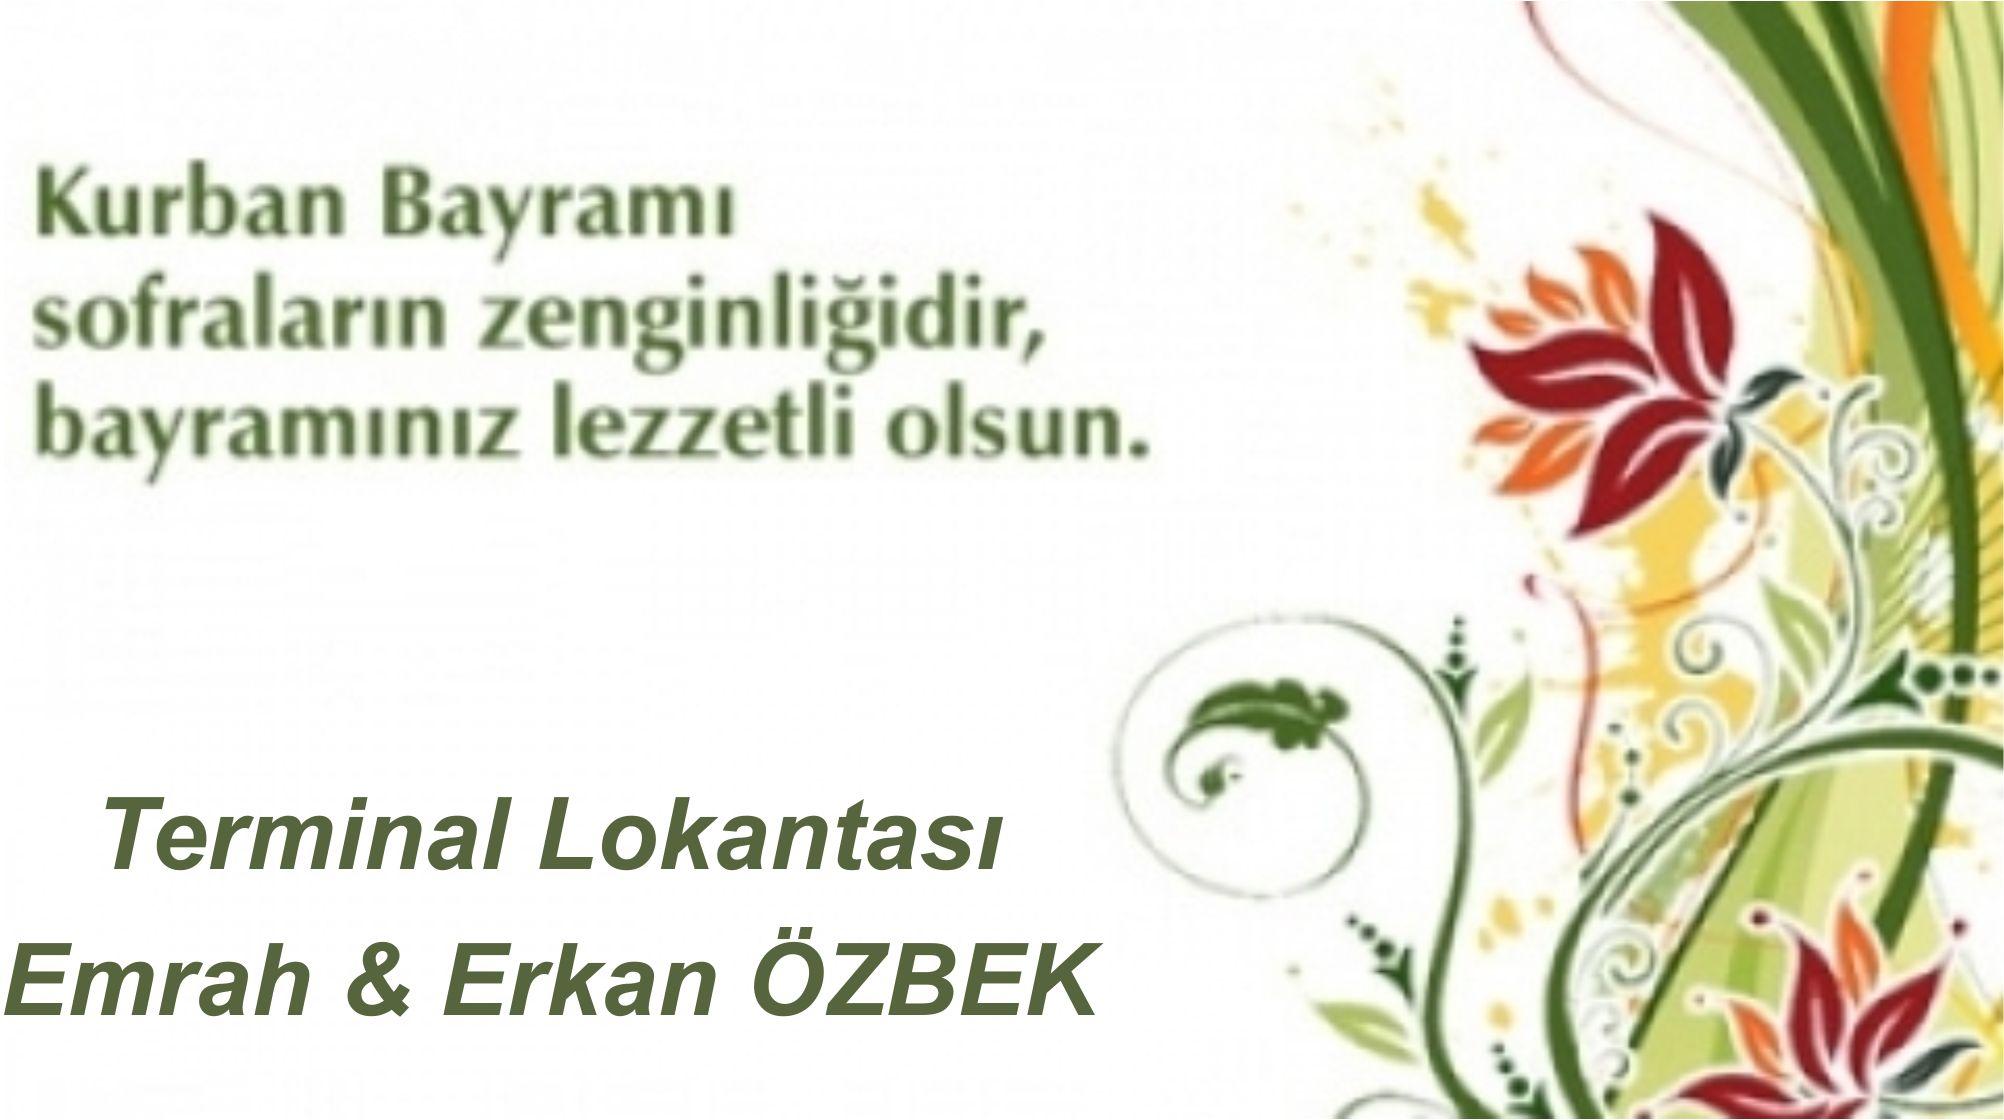 Поздравления на турецком языке курбан байрам